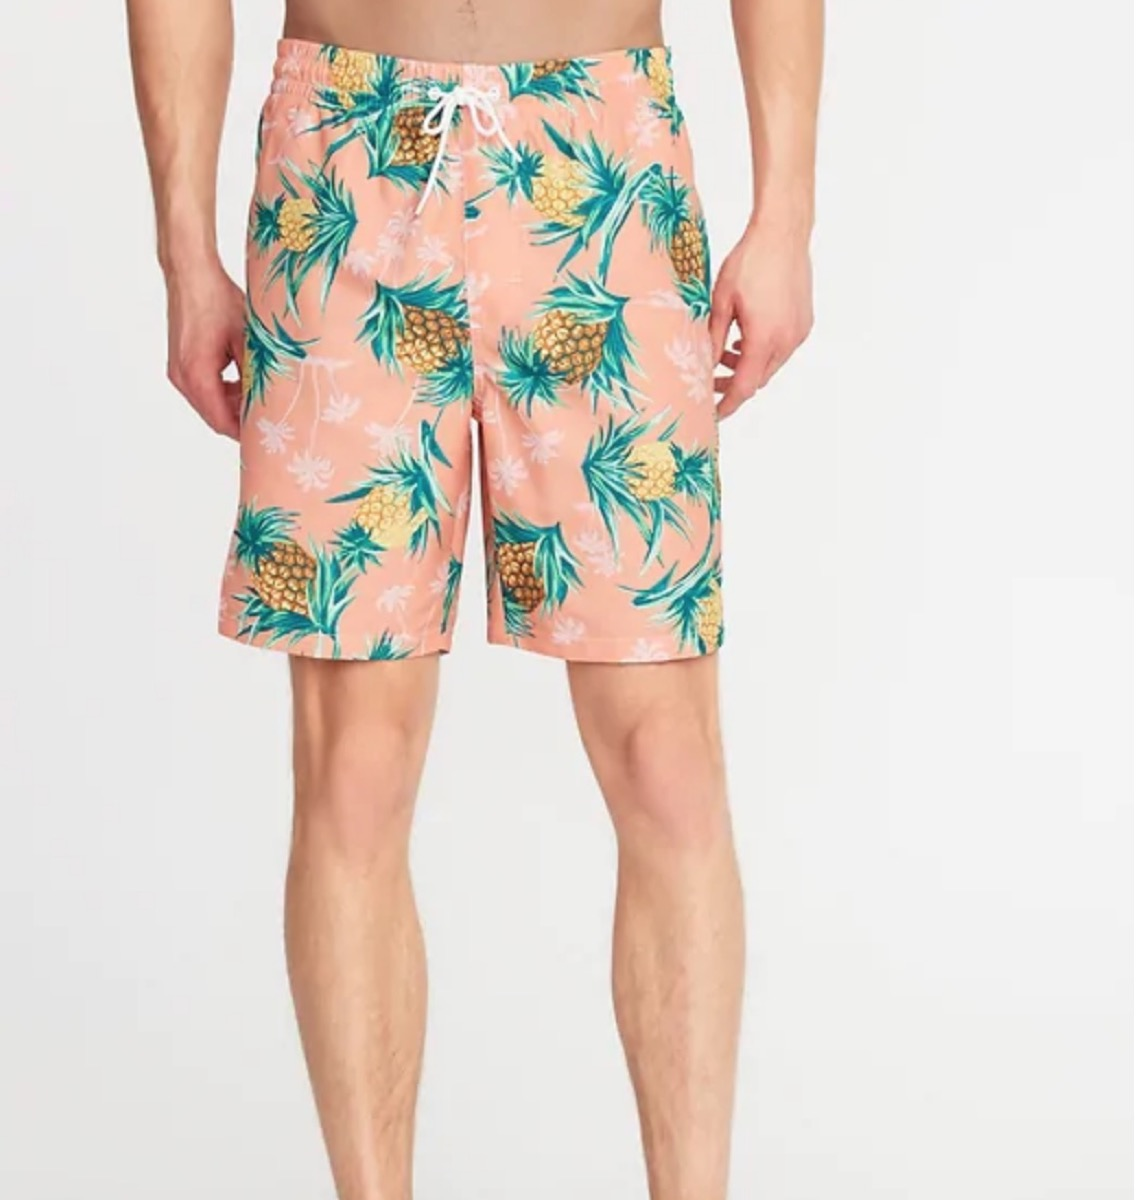 pineapple print swim trunks, cheap swimsuits